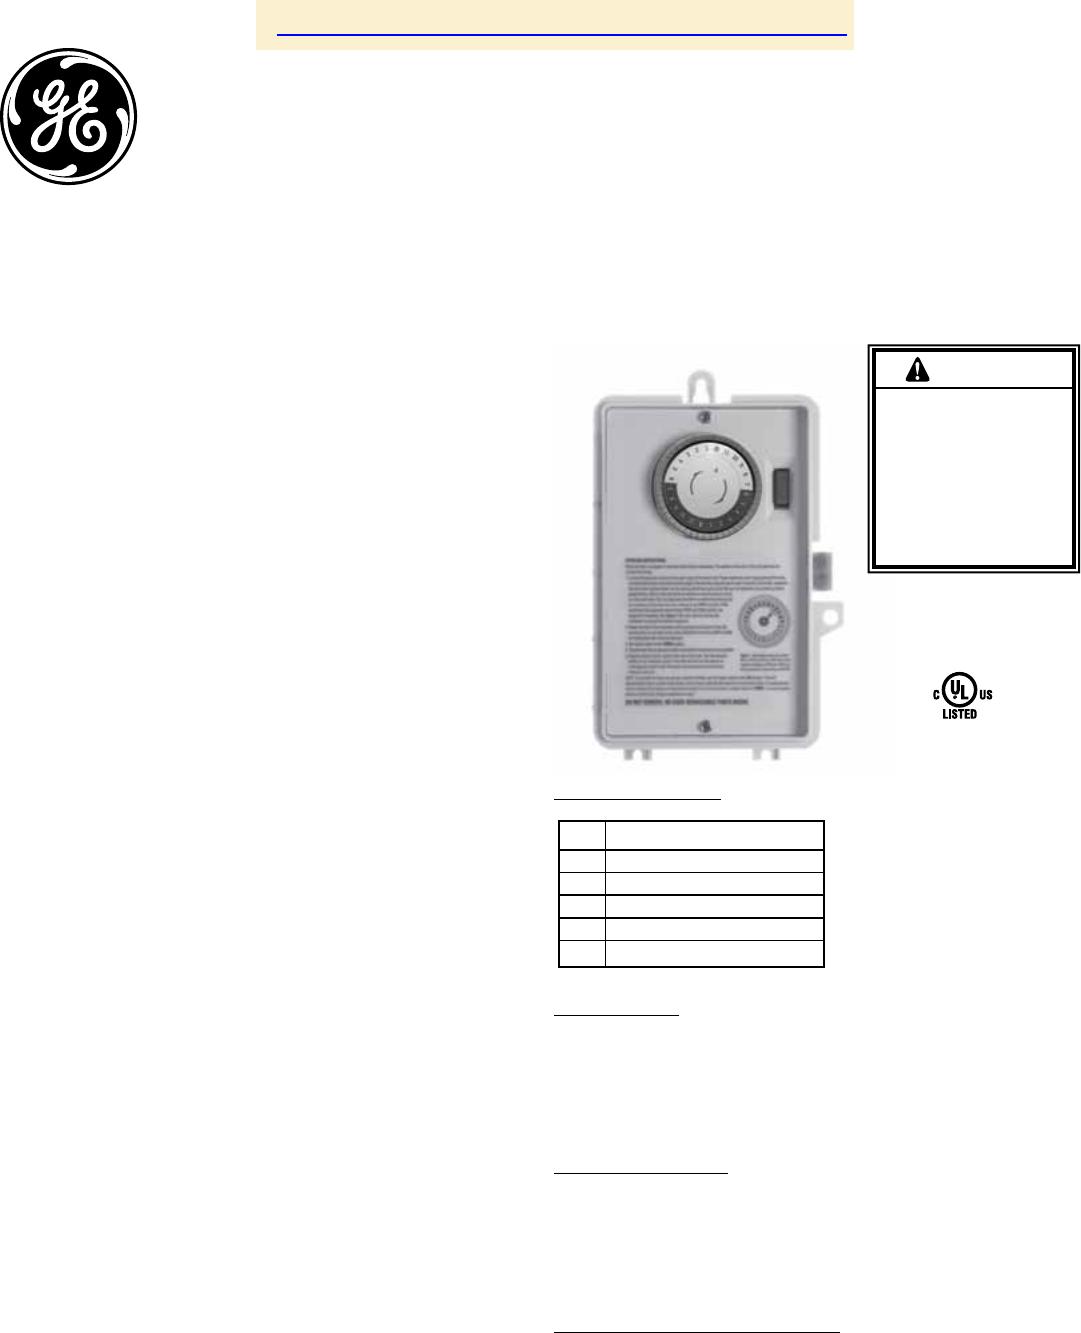 handleiding ge 15087 pagina 1 van 2 english rh gebruikershandleiding com